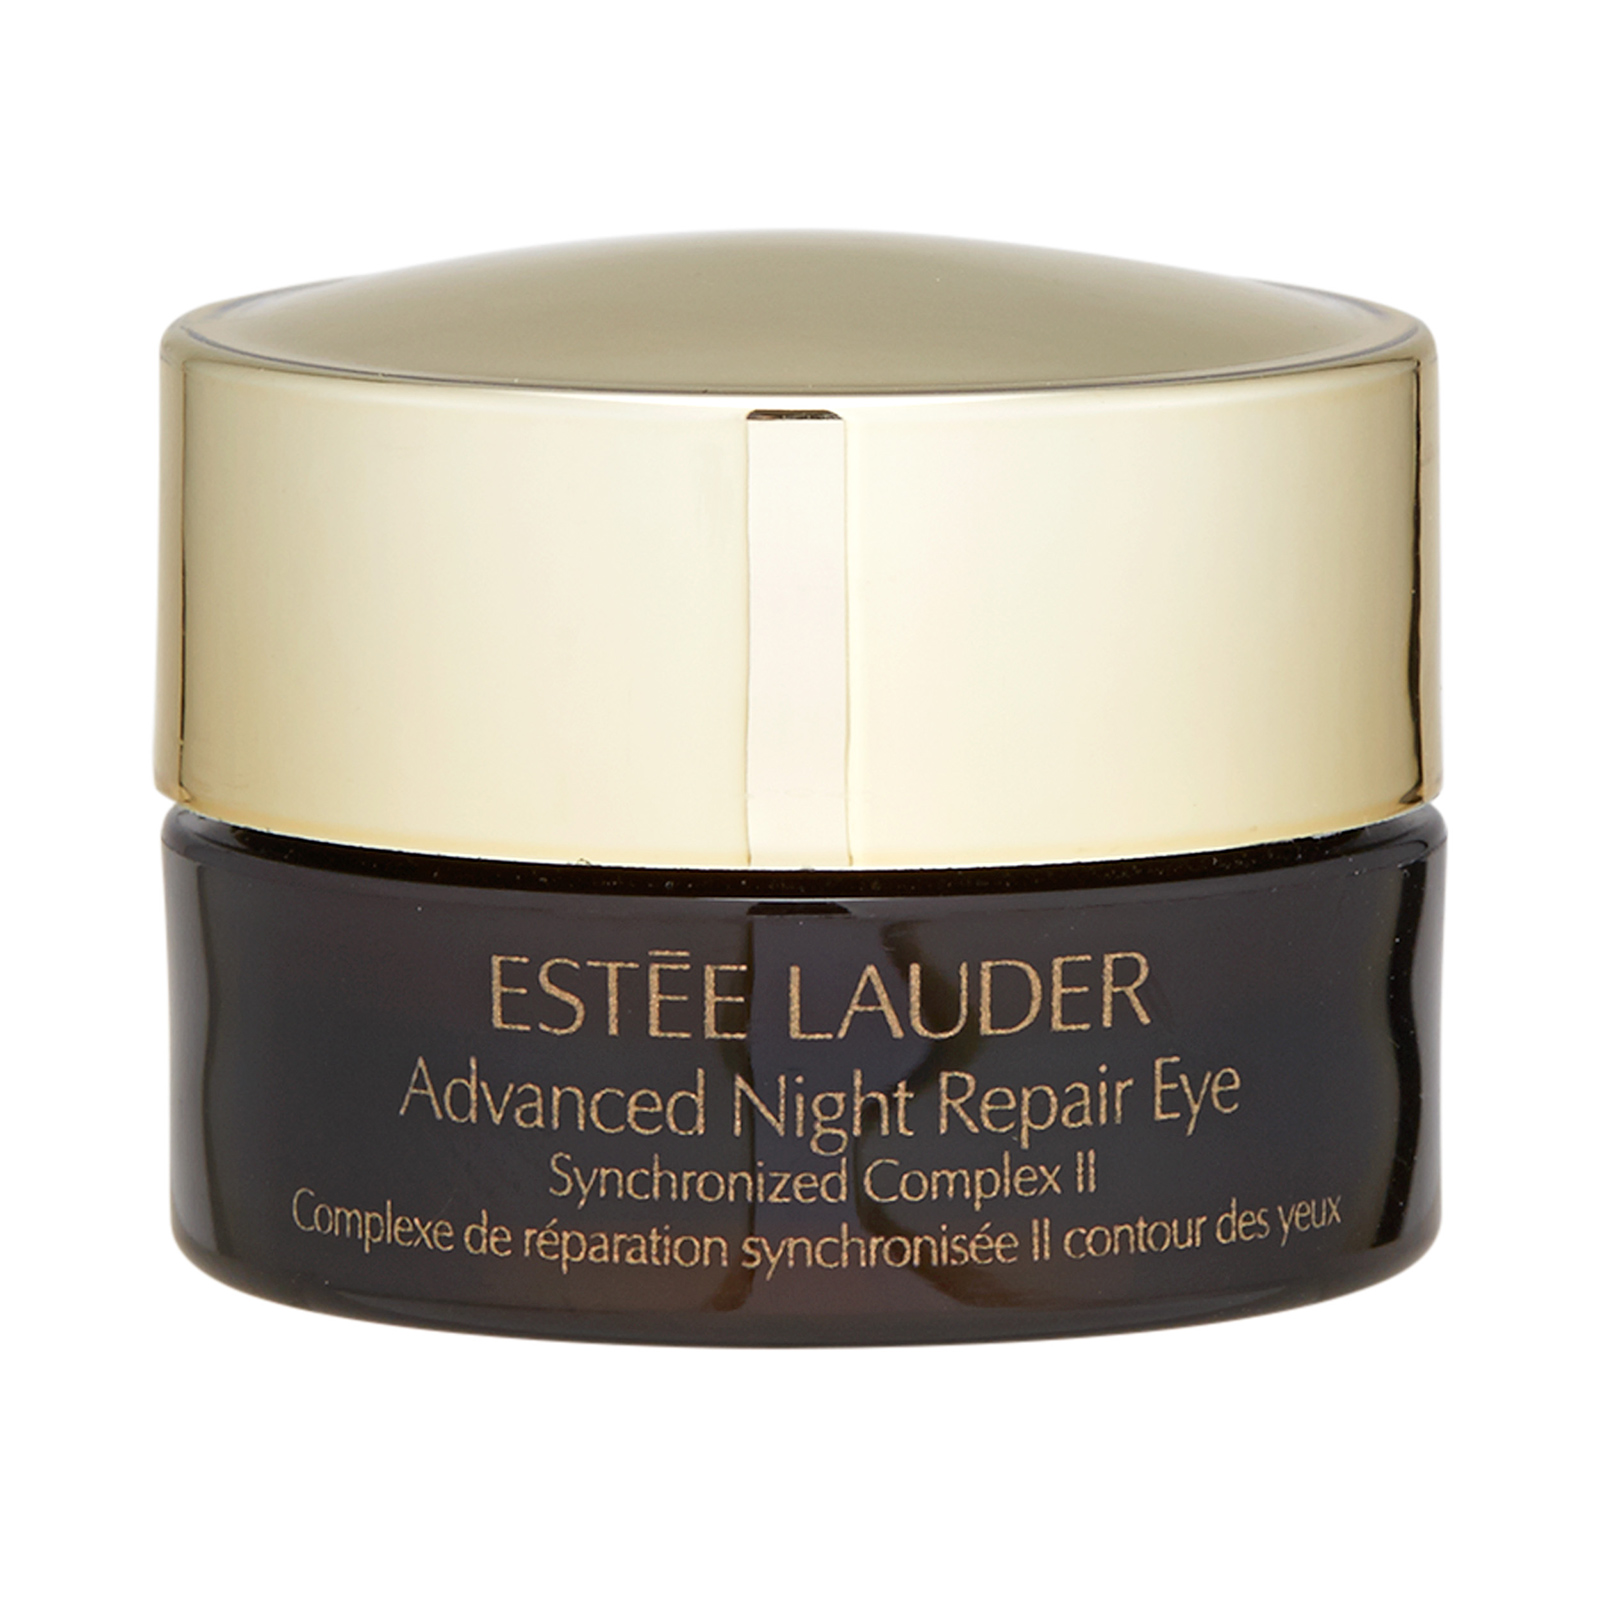 Estée Lauder Advanced Night Repair Eye Synchronized Complex II 0.1oz, 3ml from Cosme-De.com